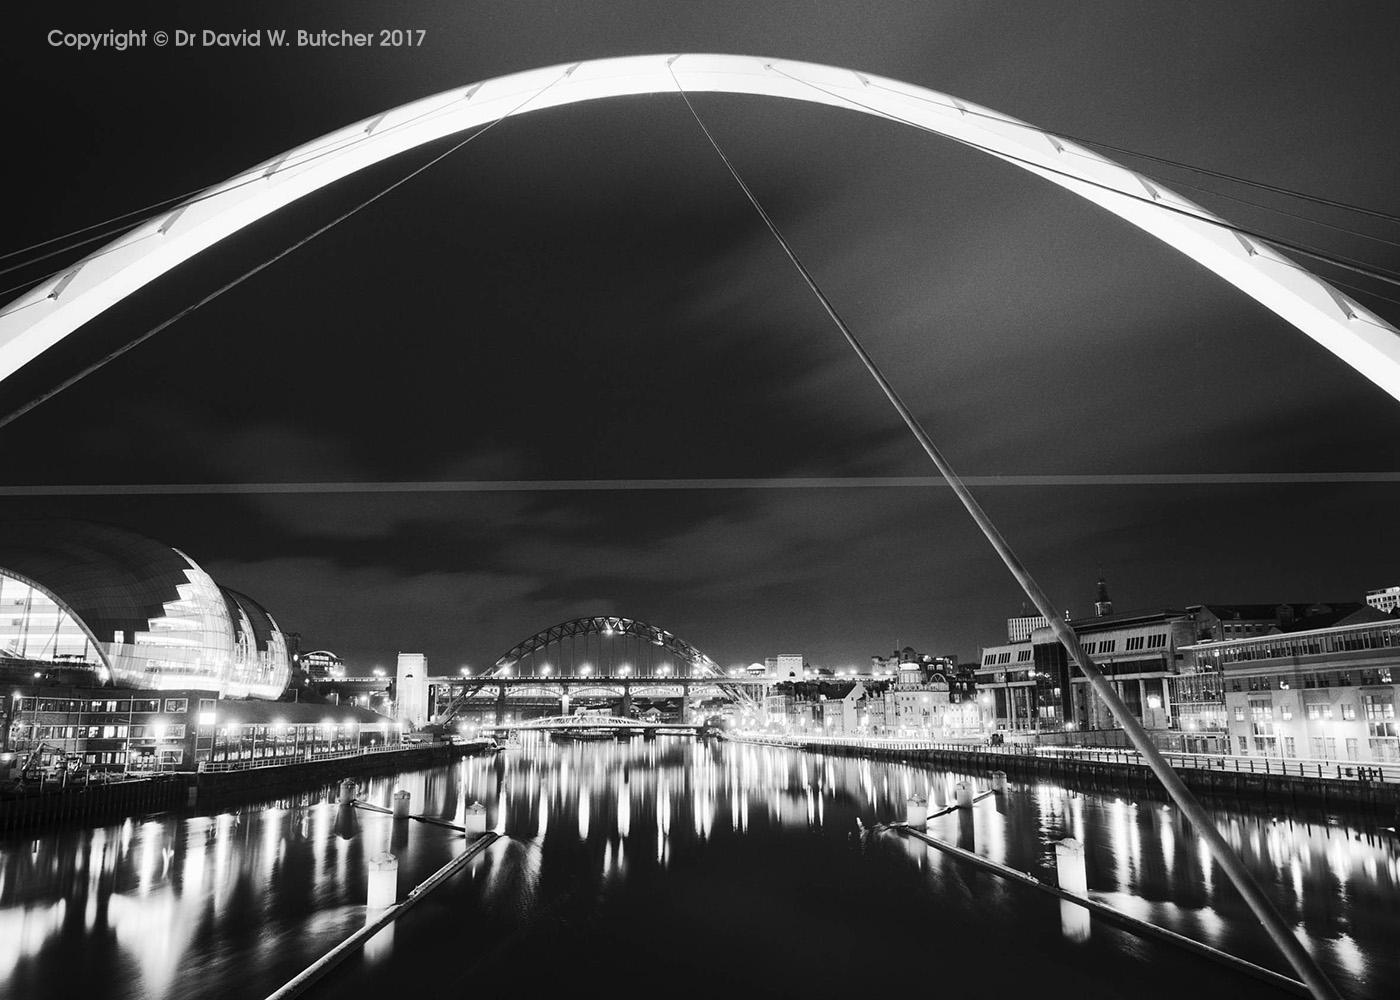 Newcastle Tyne Bridge from Gateshead Millennium Bridge